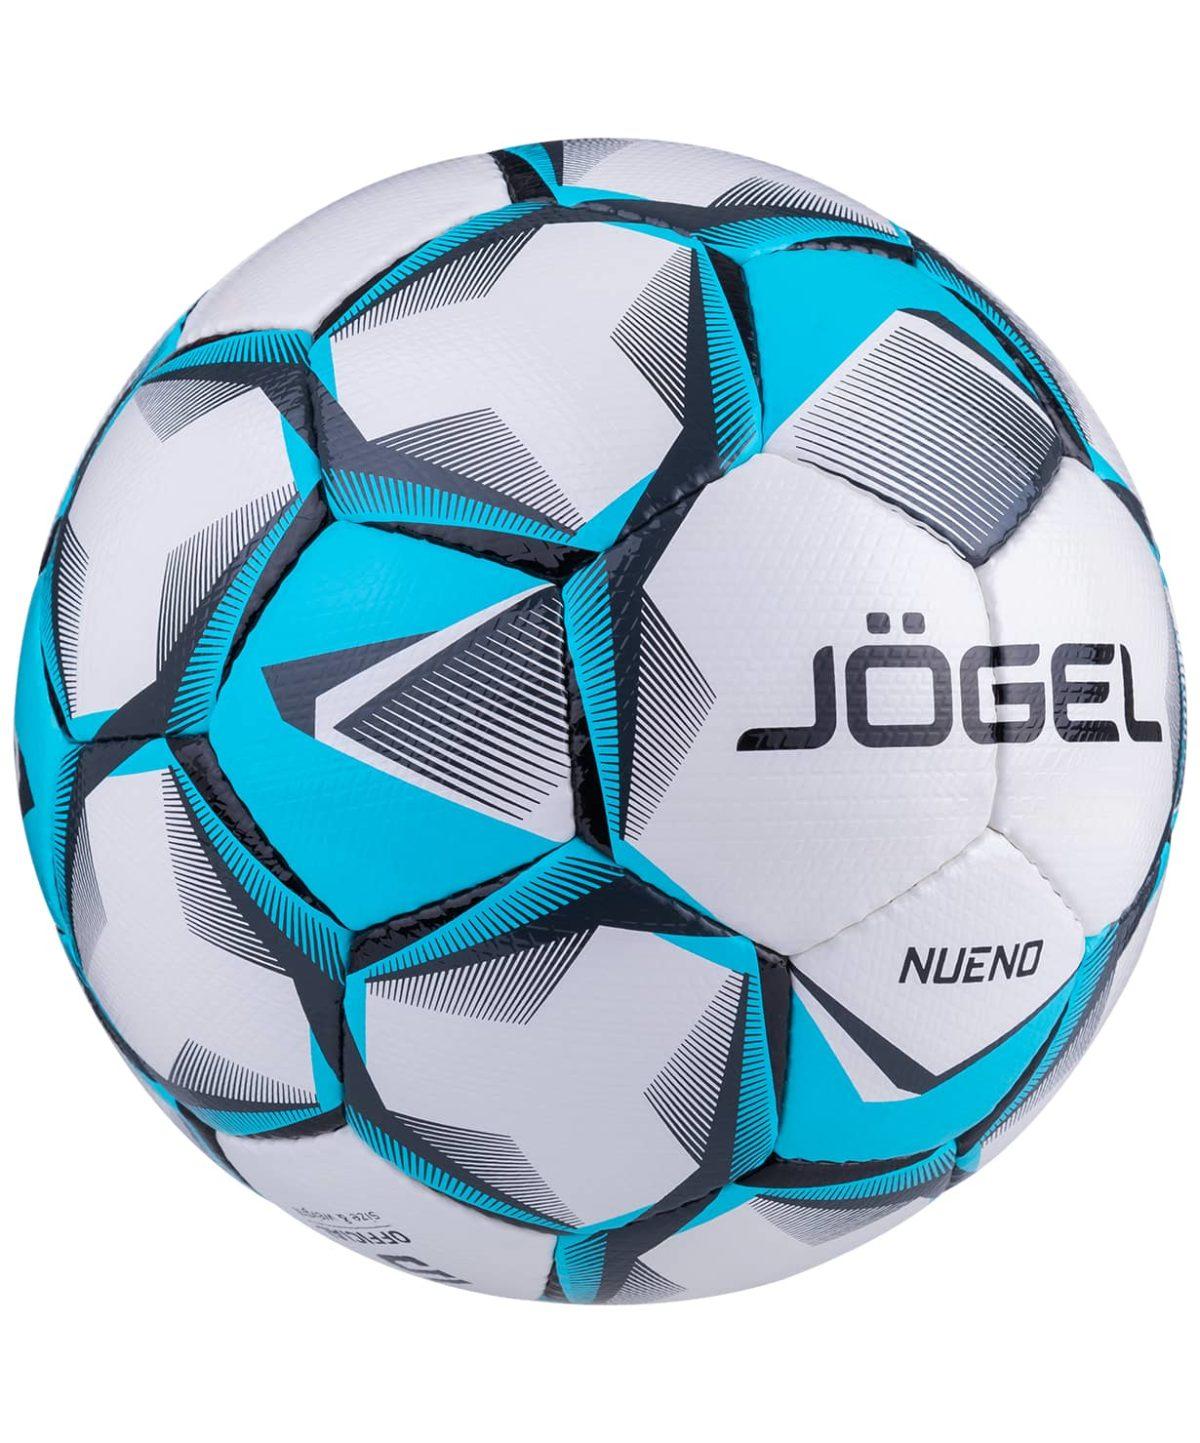 JOGEL Nueno Мяч футбольный  Nueno №5 (BC-20) - 3